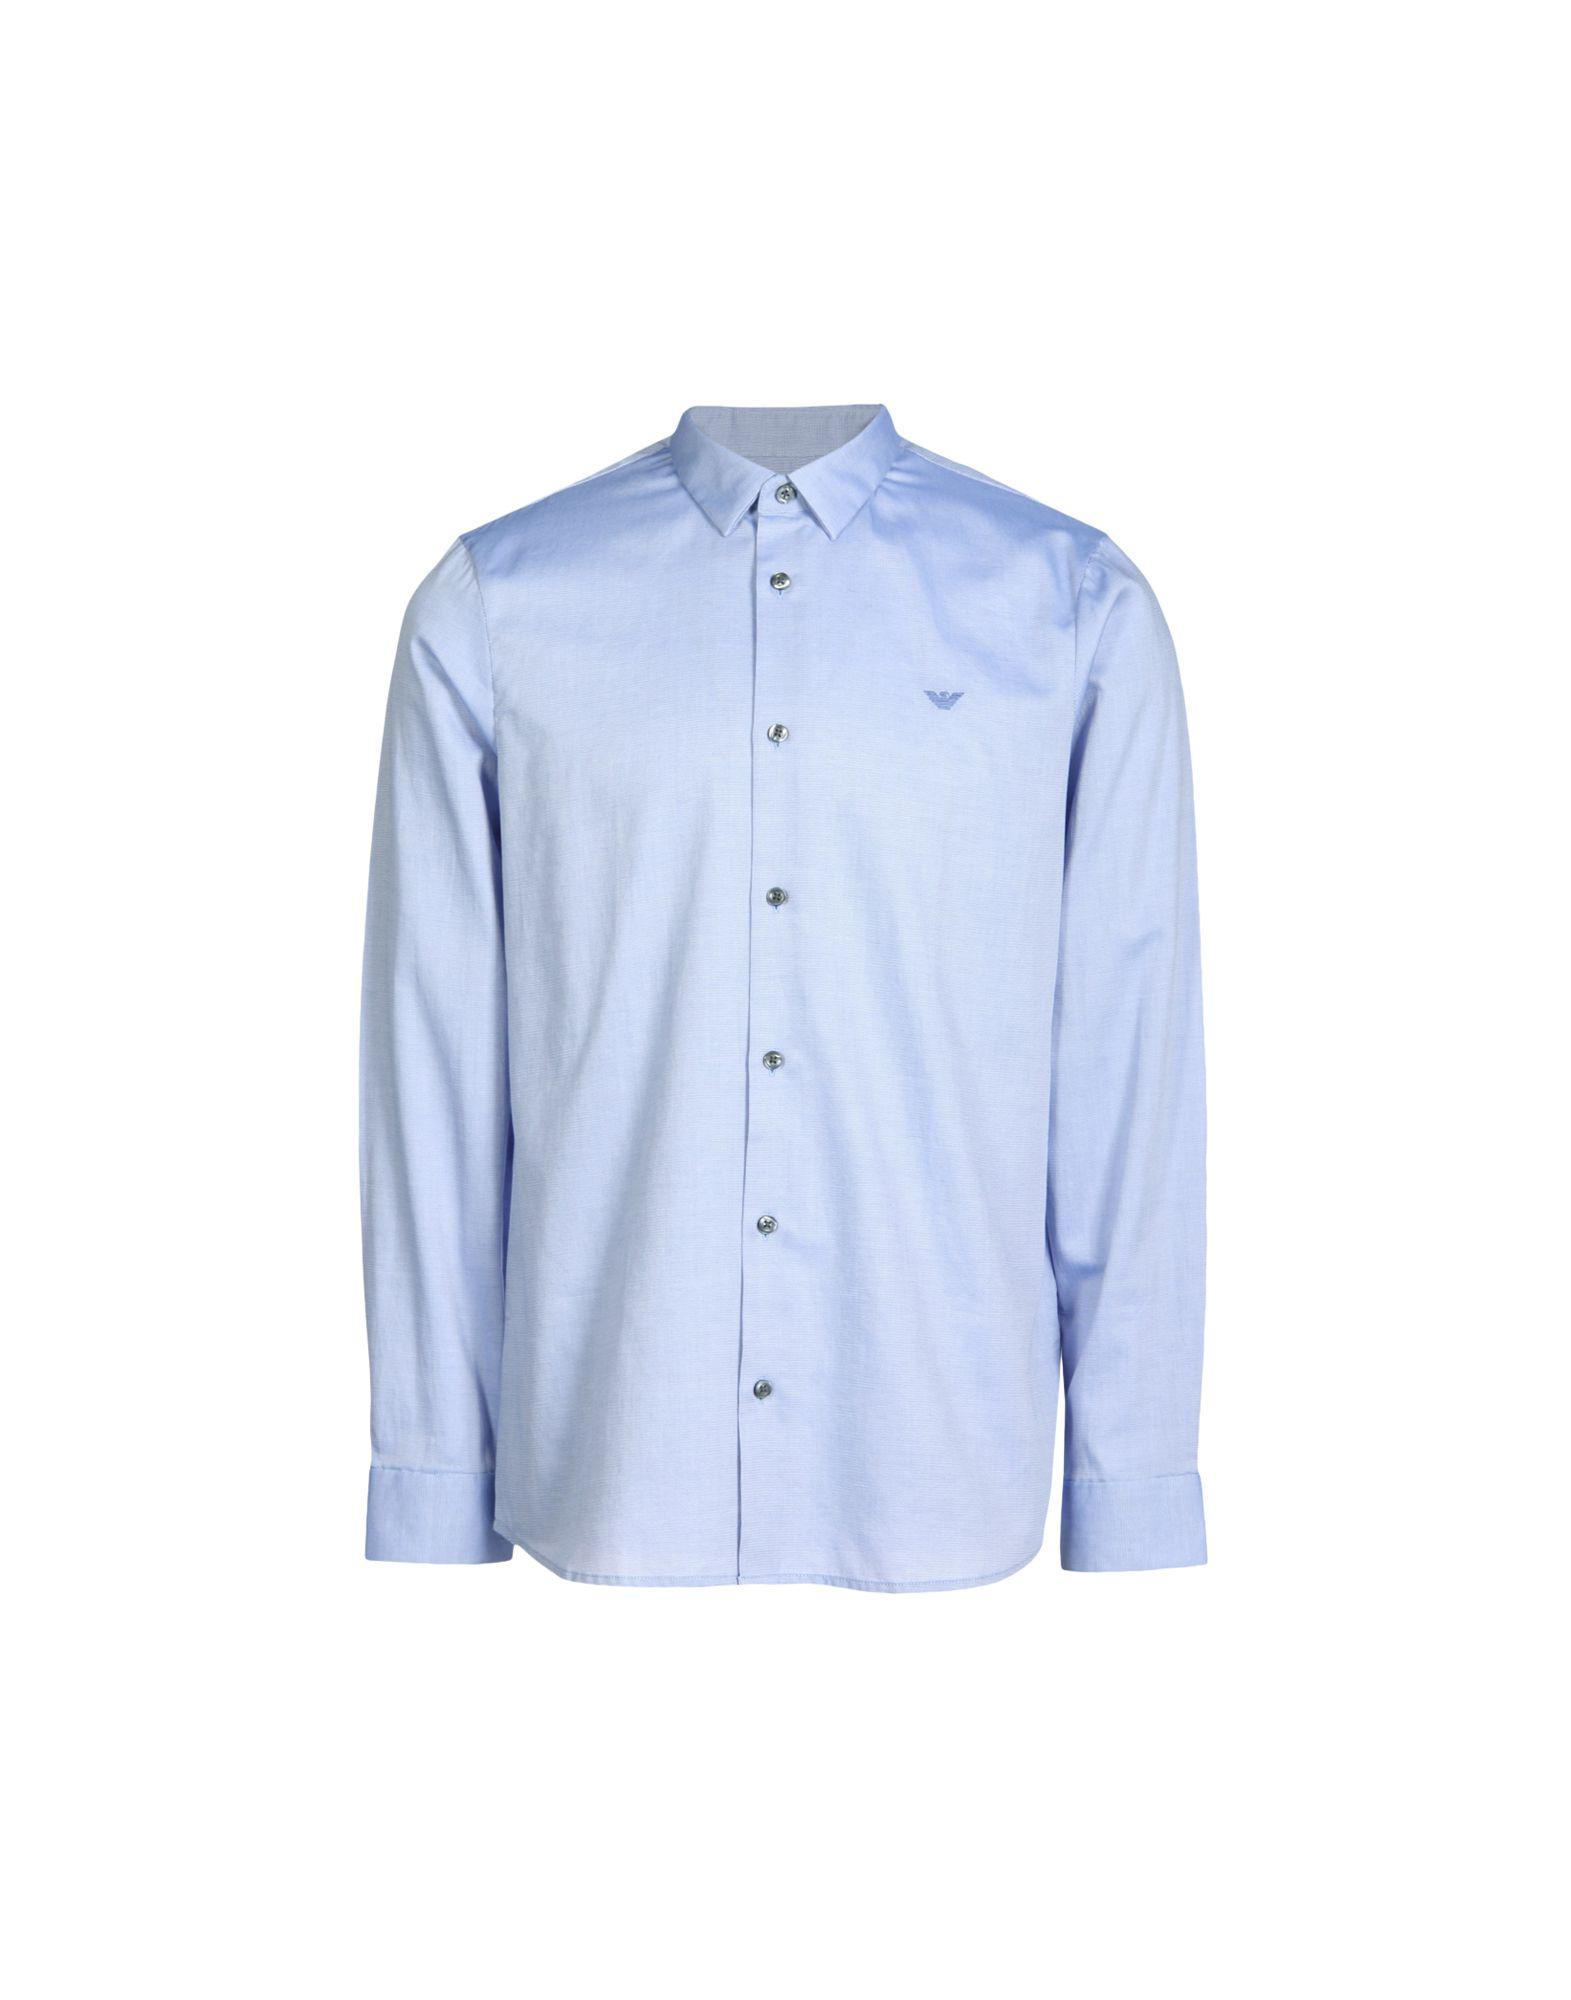 Camicia Tinta Unita Unita Unita Emporio Armani Uomo - 38681824RF 3a7fc3